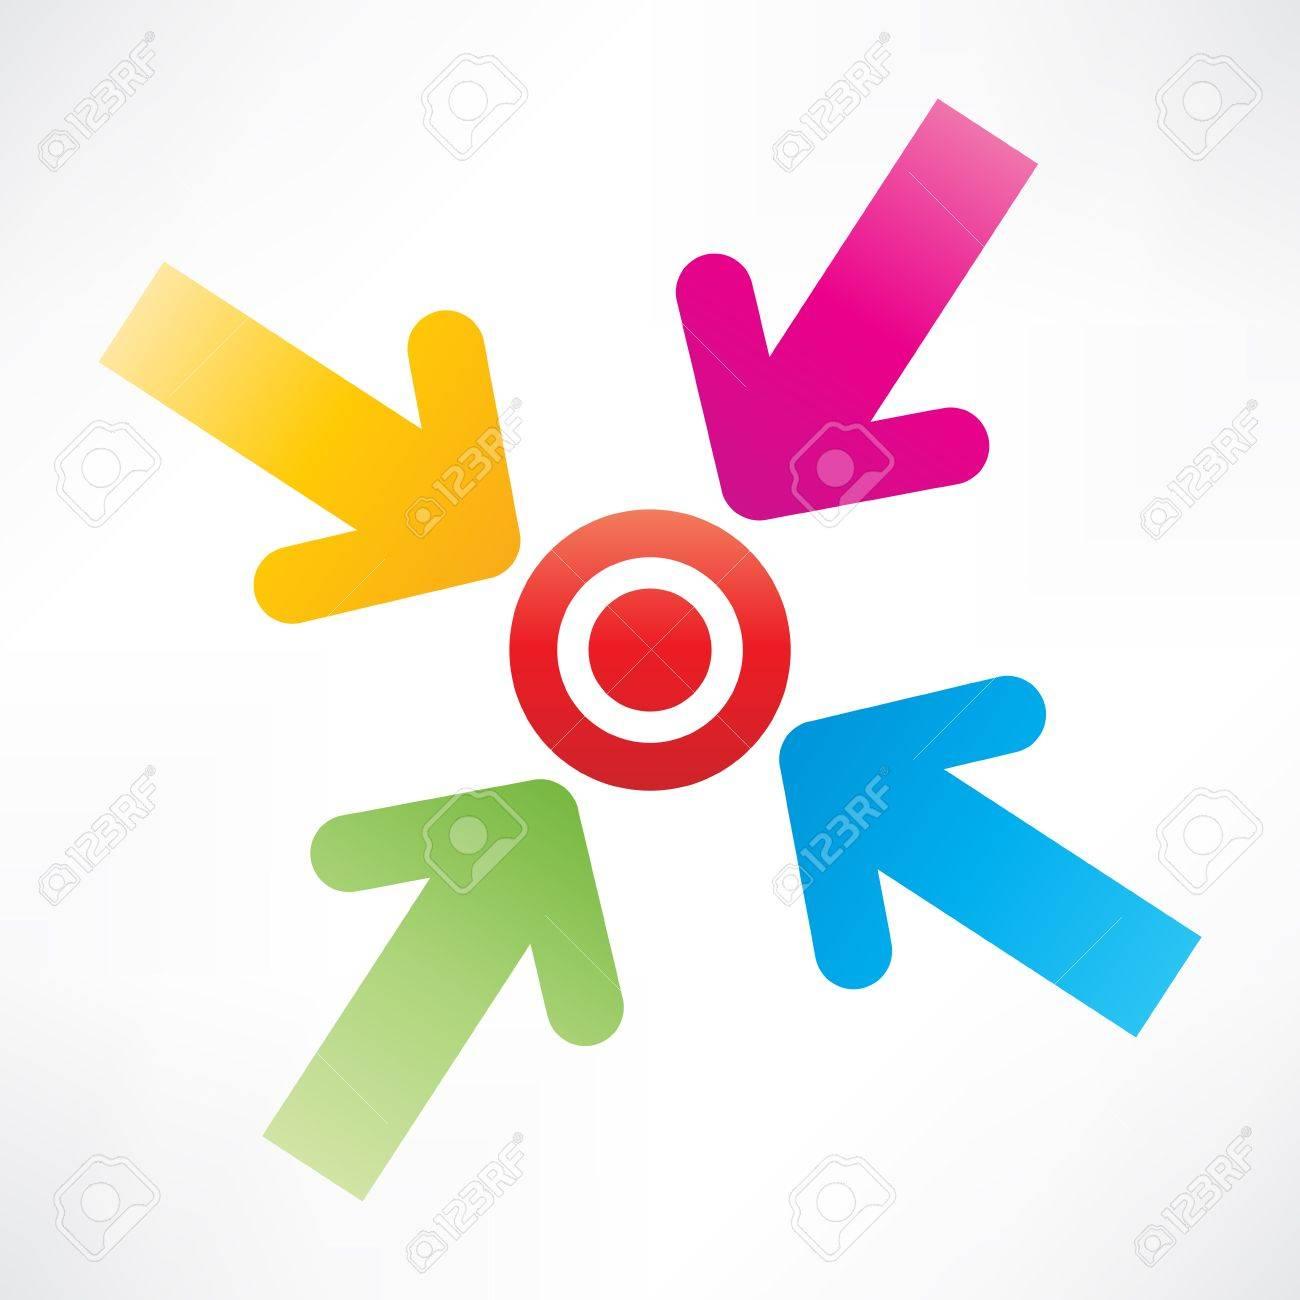 Target with arrows Standard-Bild - 25820008